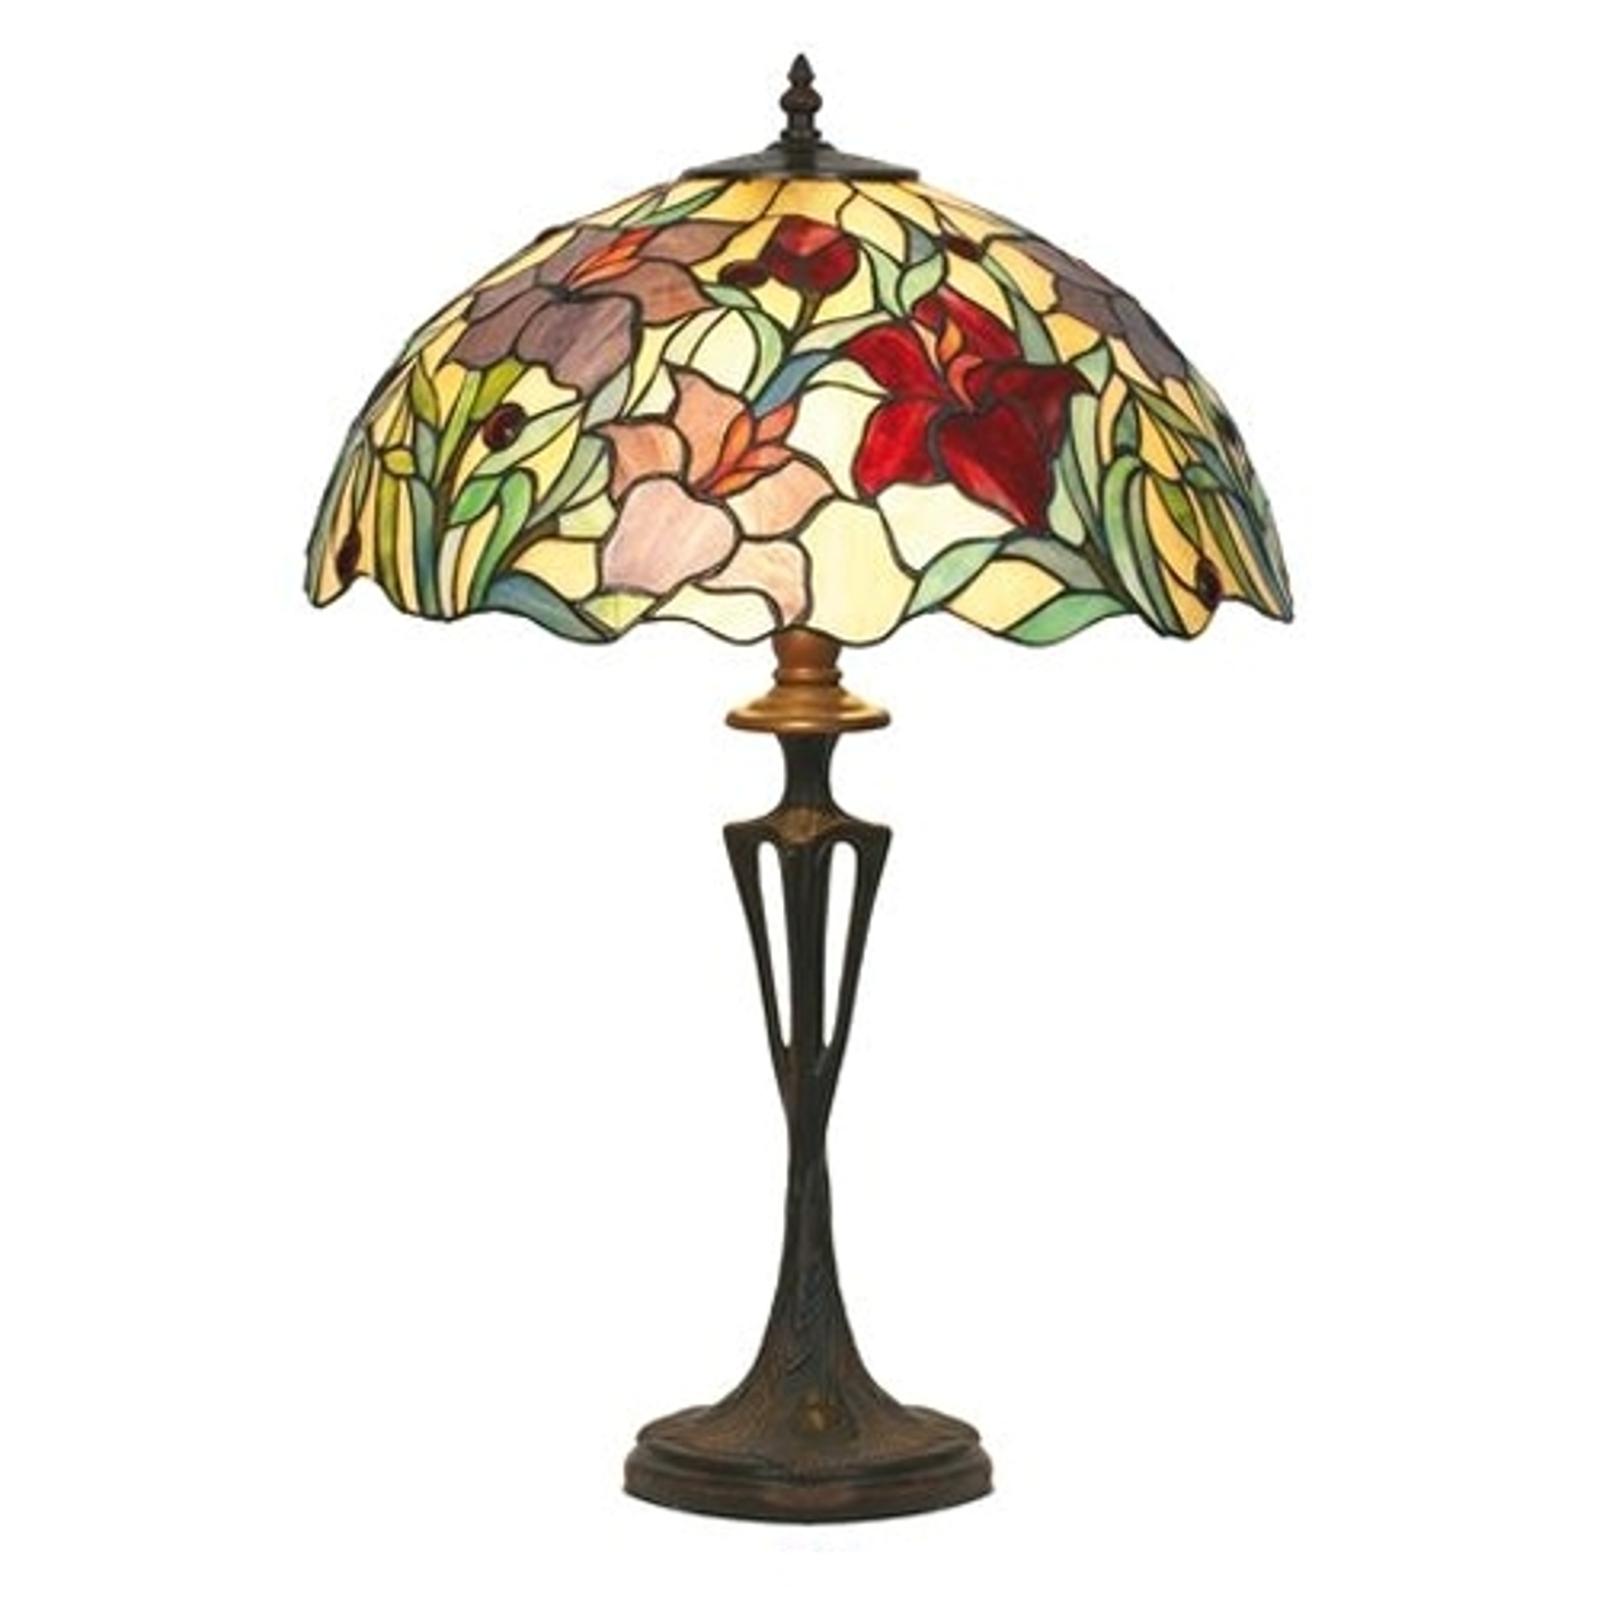 Tiffany style table lamp Athina_1032188_1